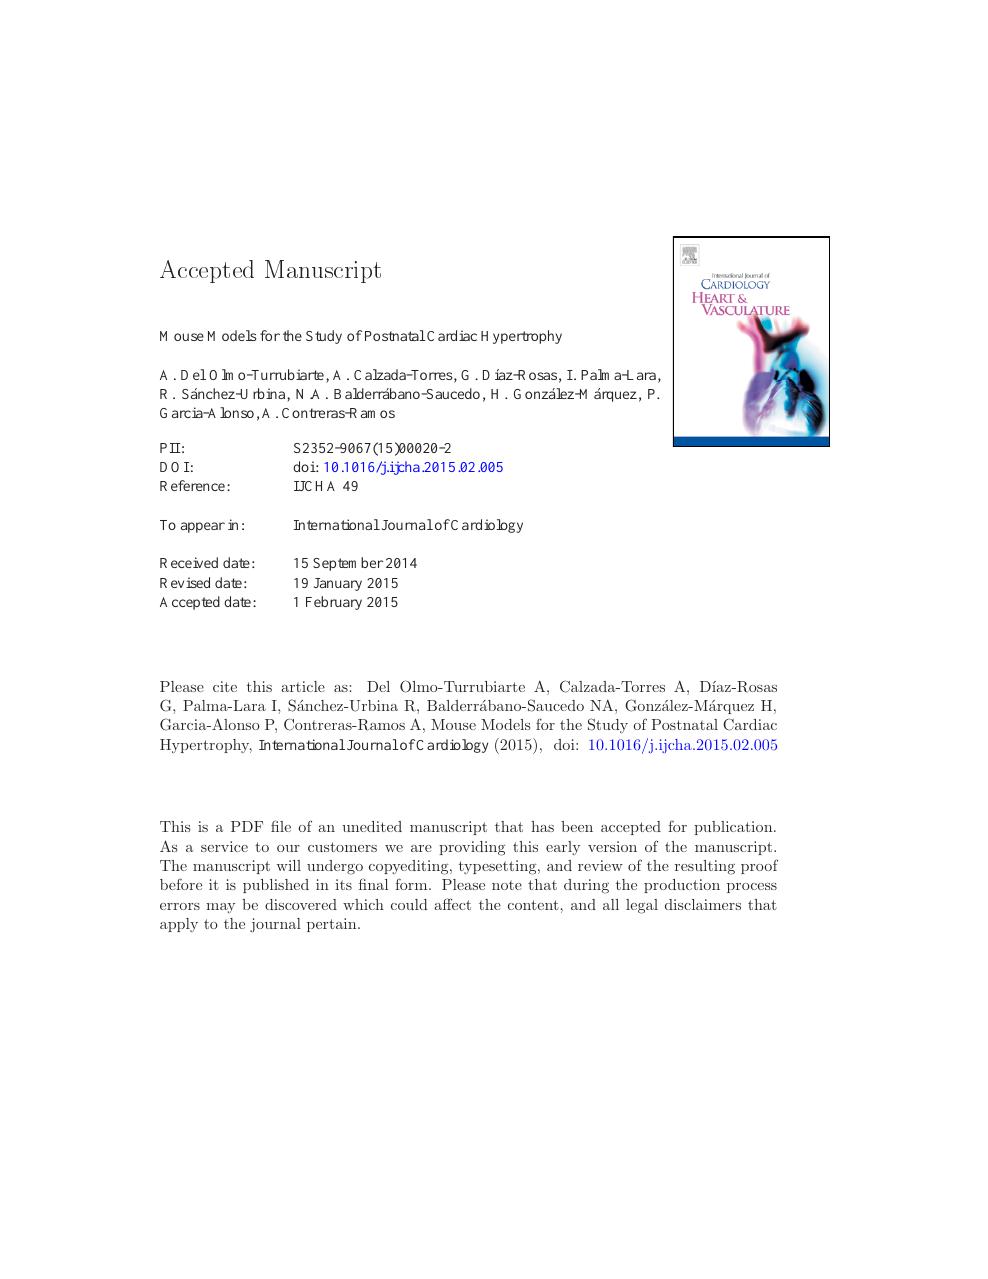 Mouse models for the study of postnatal cardiac hypertrophy